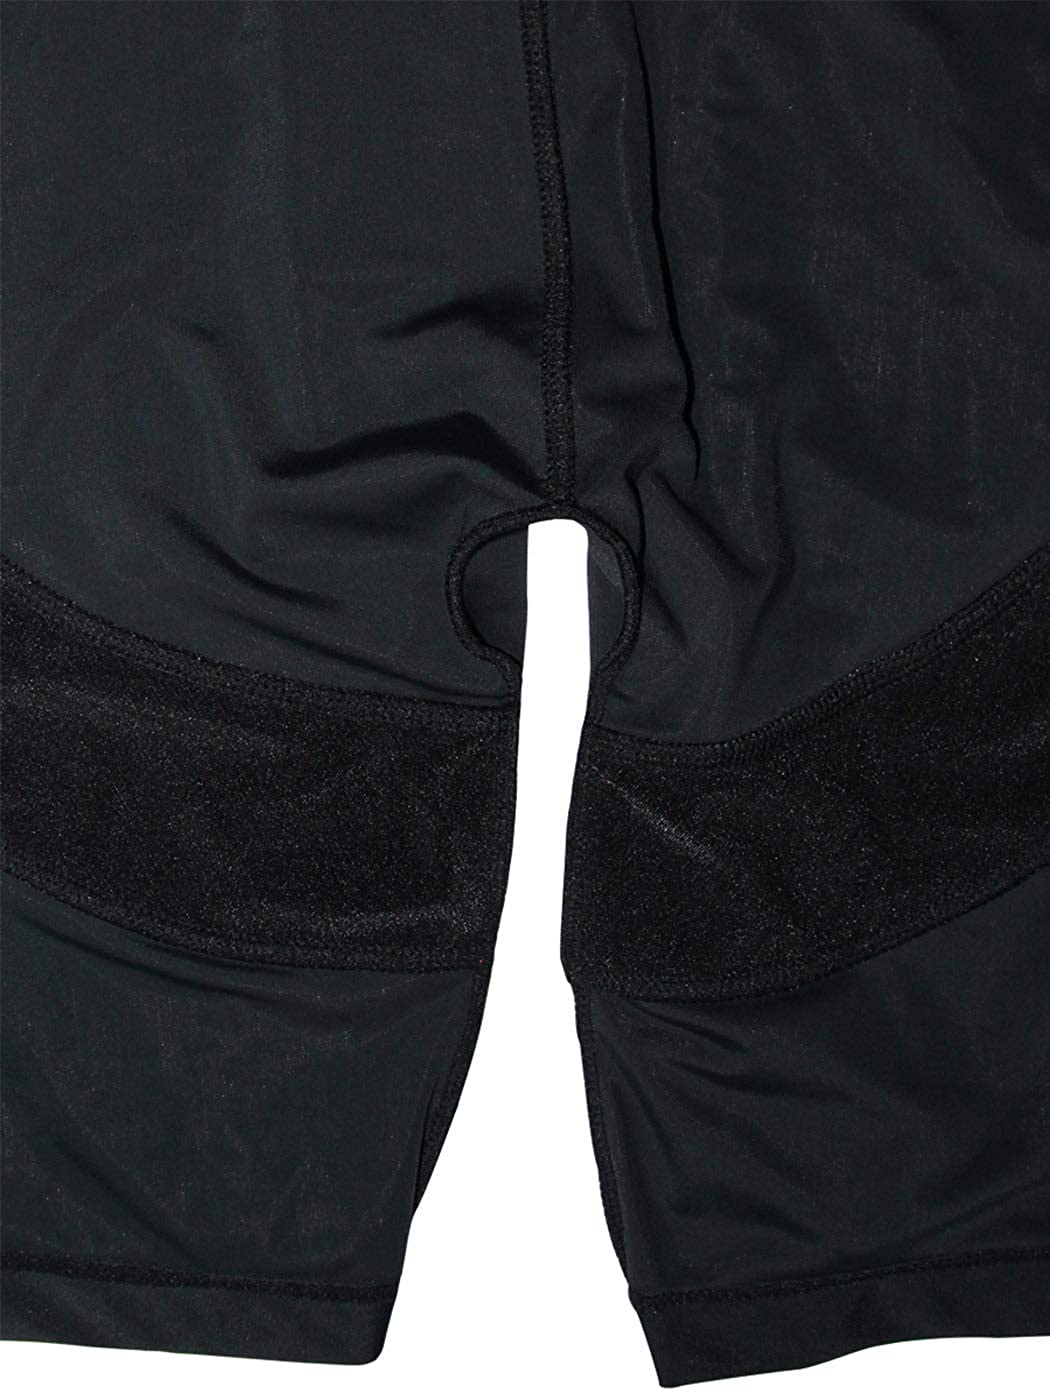 TOPMELON Mens Hi-Waist Butt Lifter Shorts Body Slimming Panties Waist Trainer Tummy Control Boxer Brief Shapewear